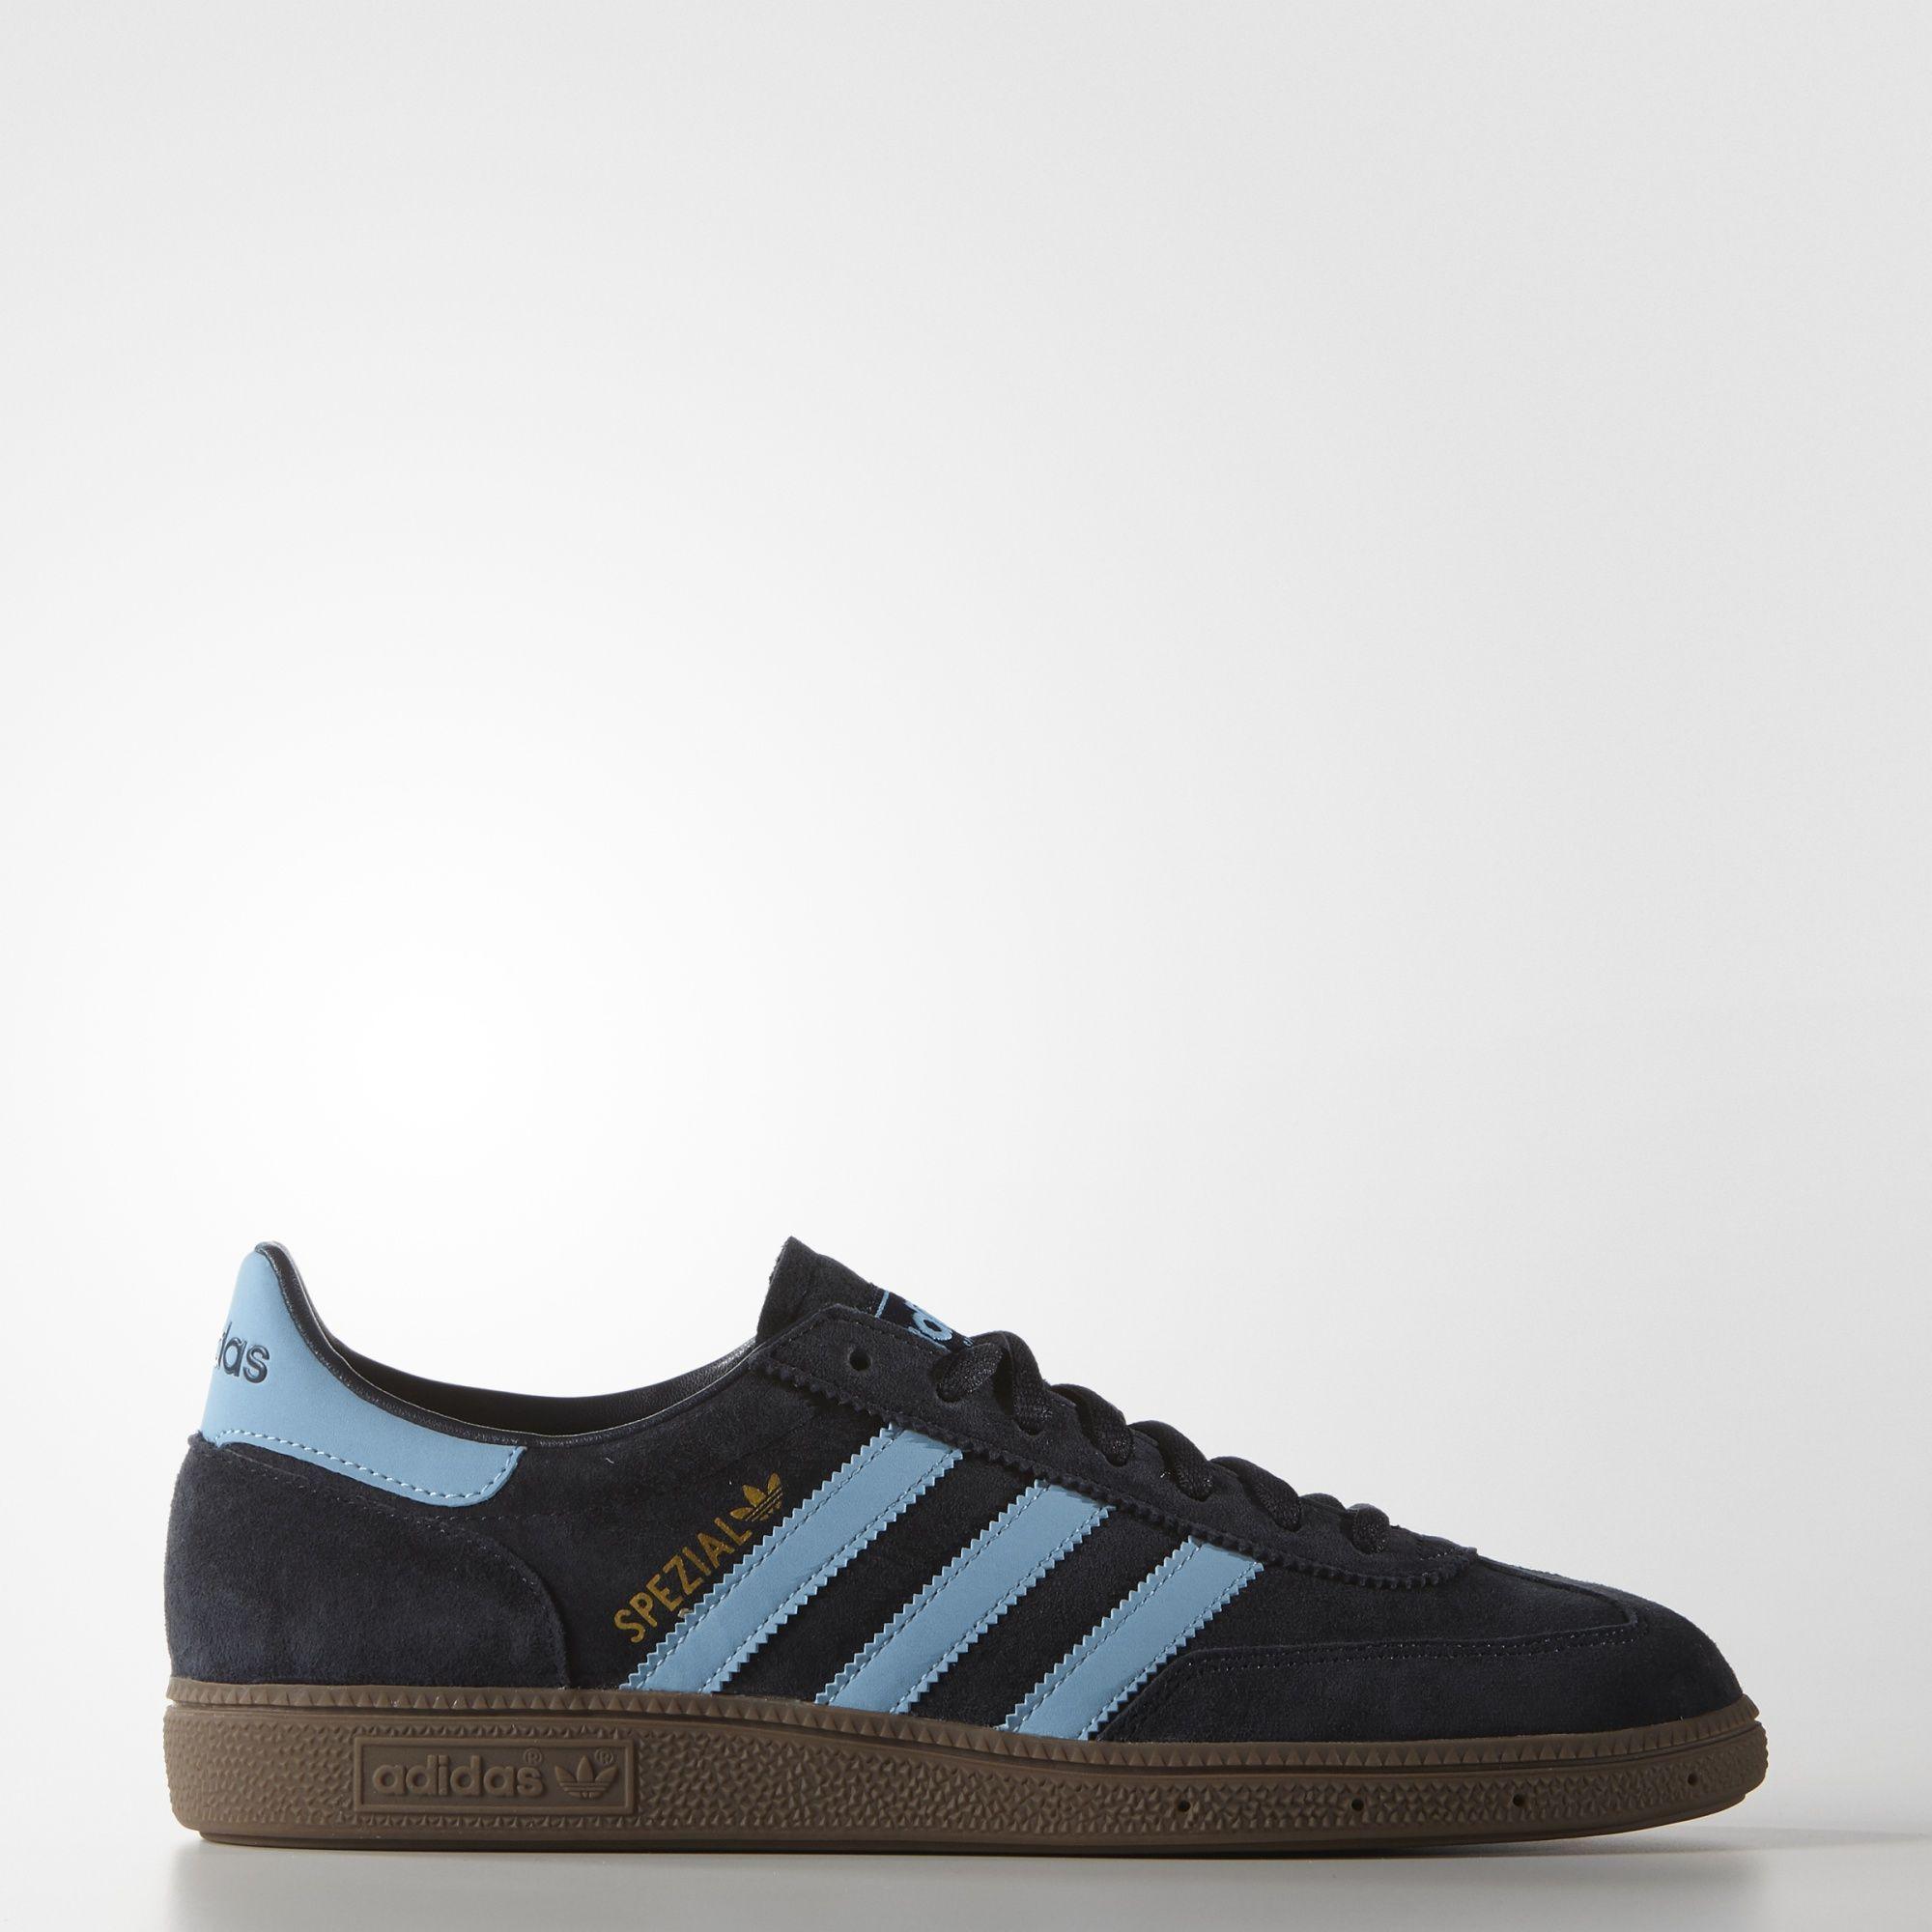 adidas - Spezial schoenen